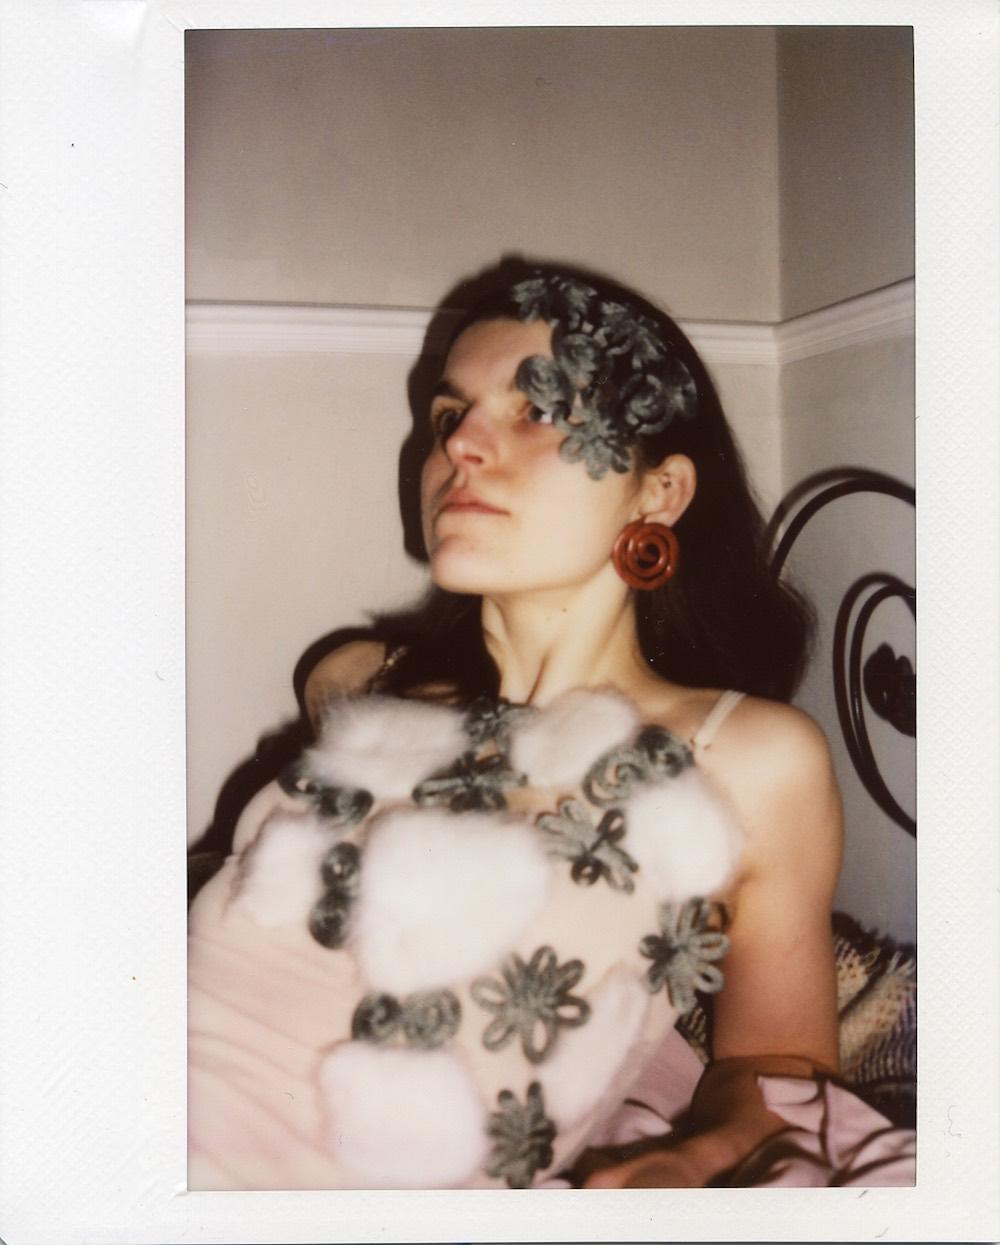 Jess by BA (Hons) Fashion Textiles alumna Josephine Cowell.